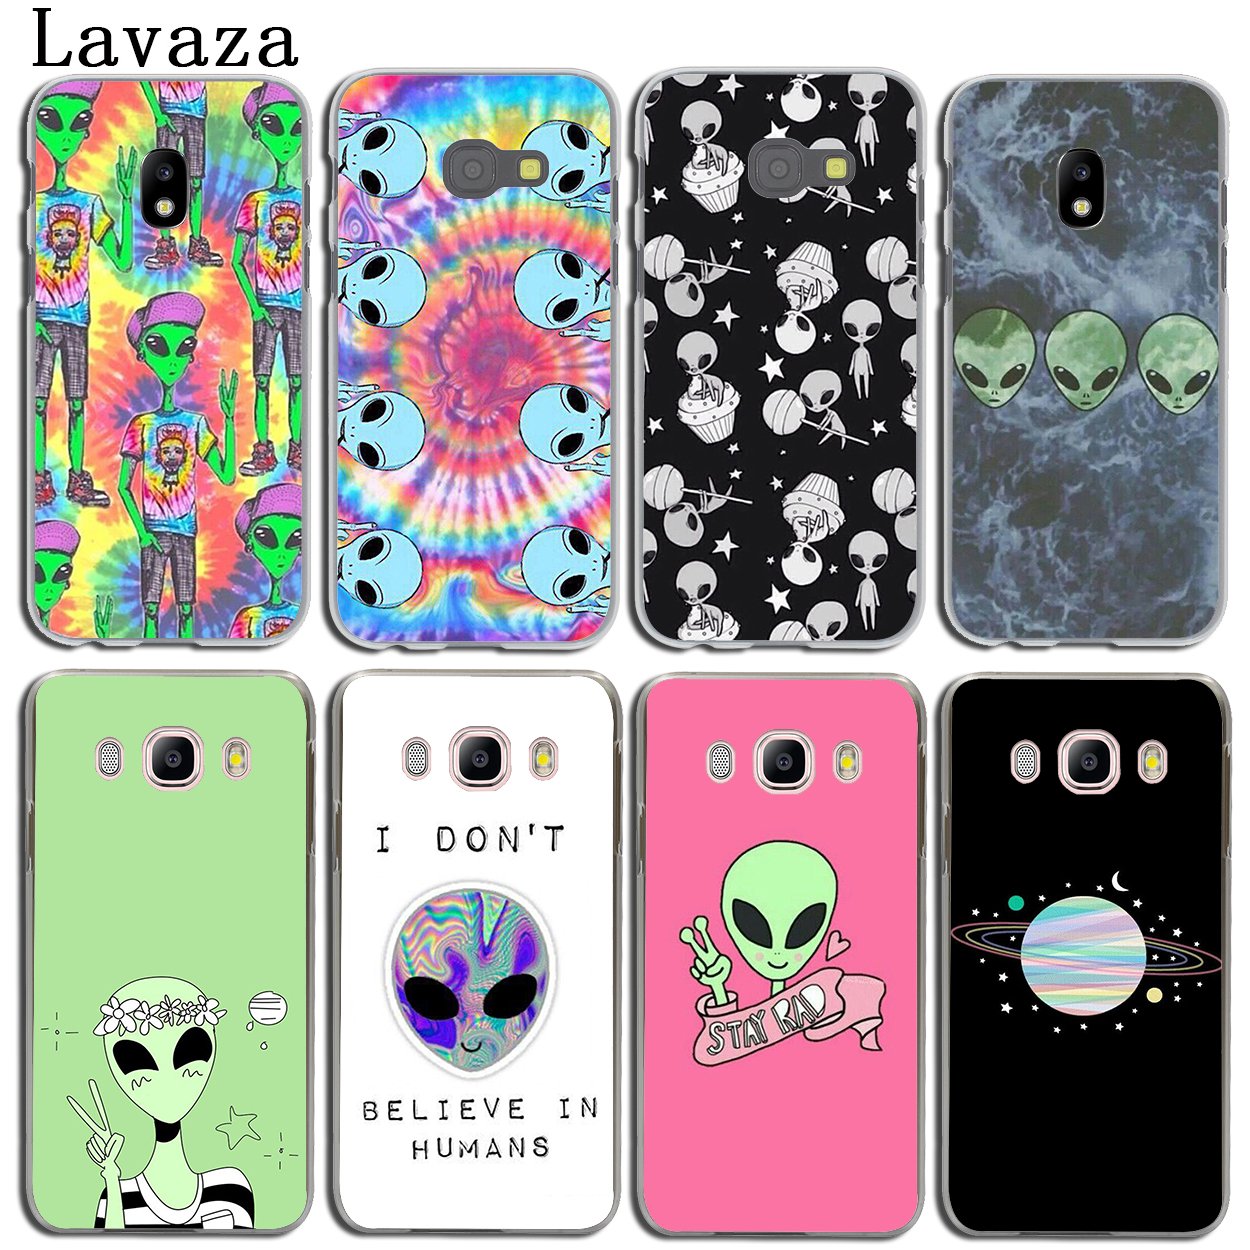 Lavaza Trippy Alien emoji Phone Shell Cover Case for Samsung Galaxy J3 J1 J2 J7 J5 2015 2016 2017 J2 Pro Ace J7 J3 J5 Prime Case